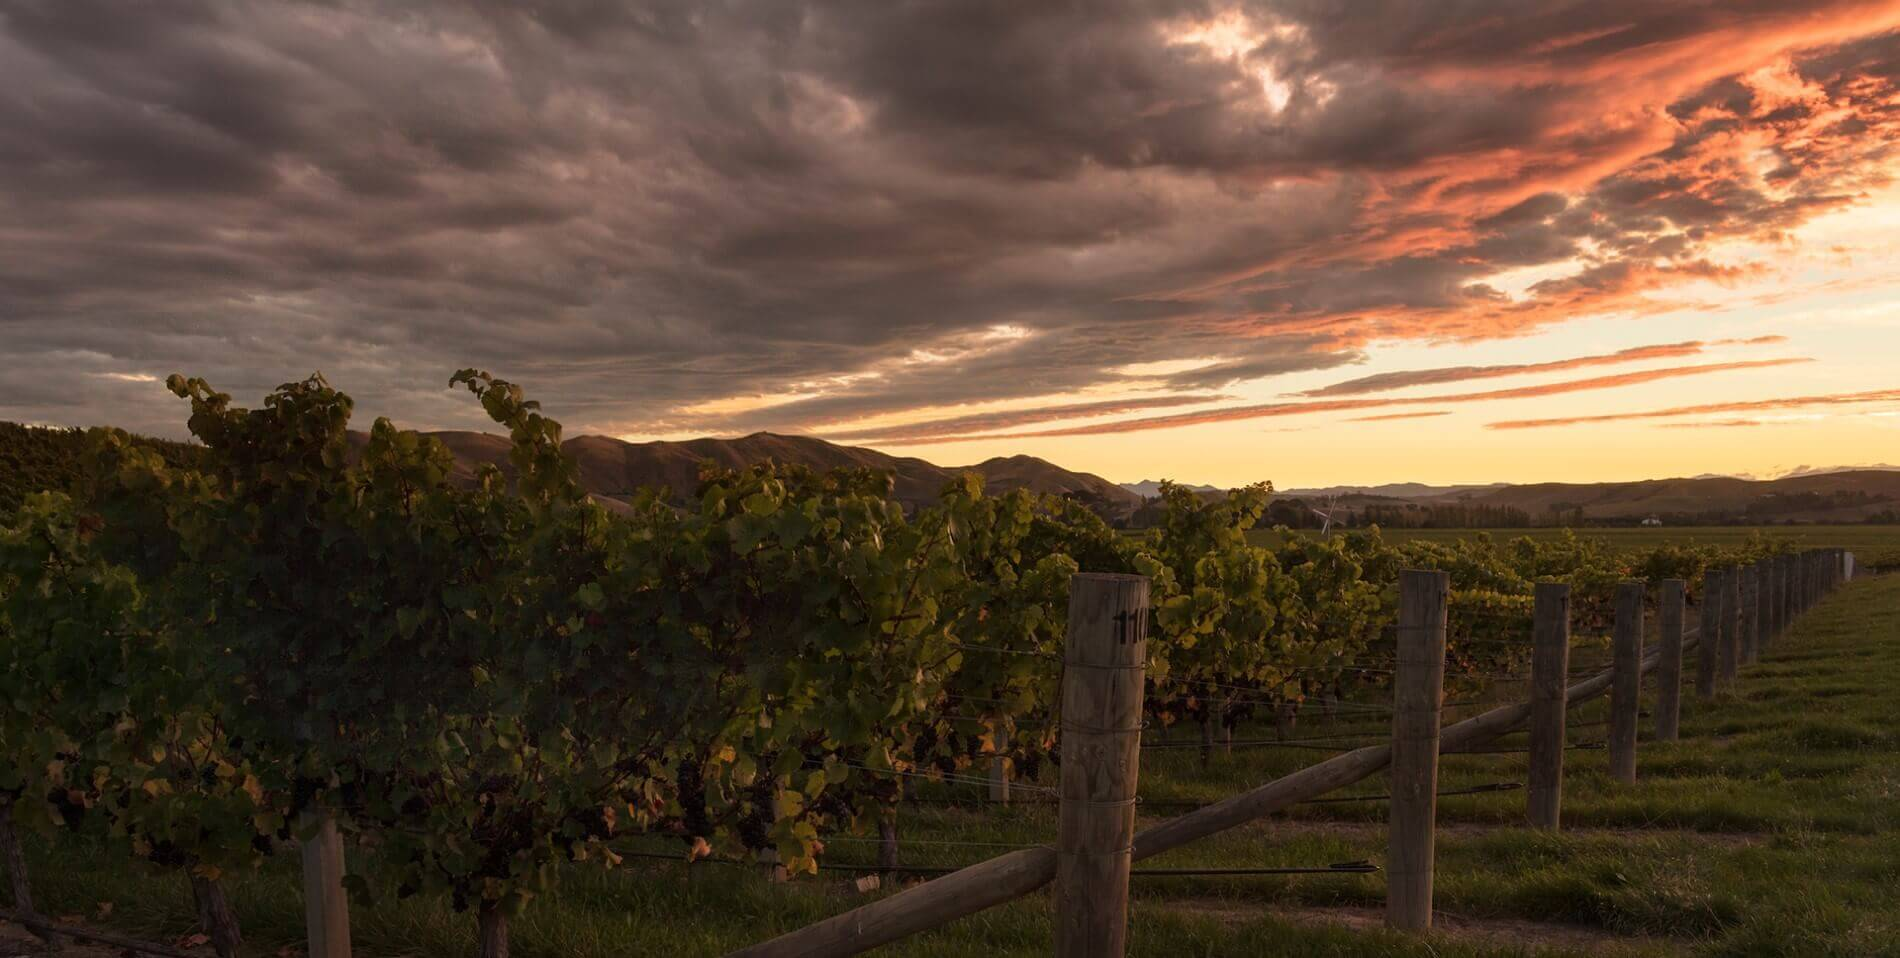 sunset at stoneleigh